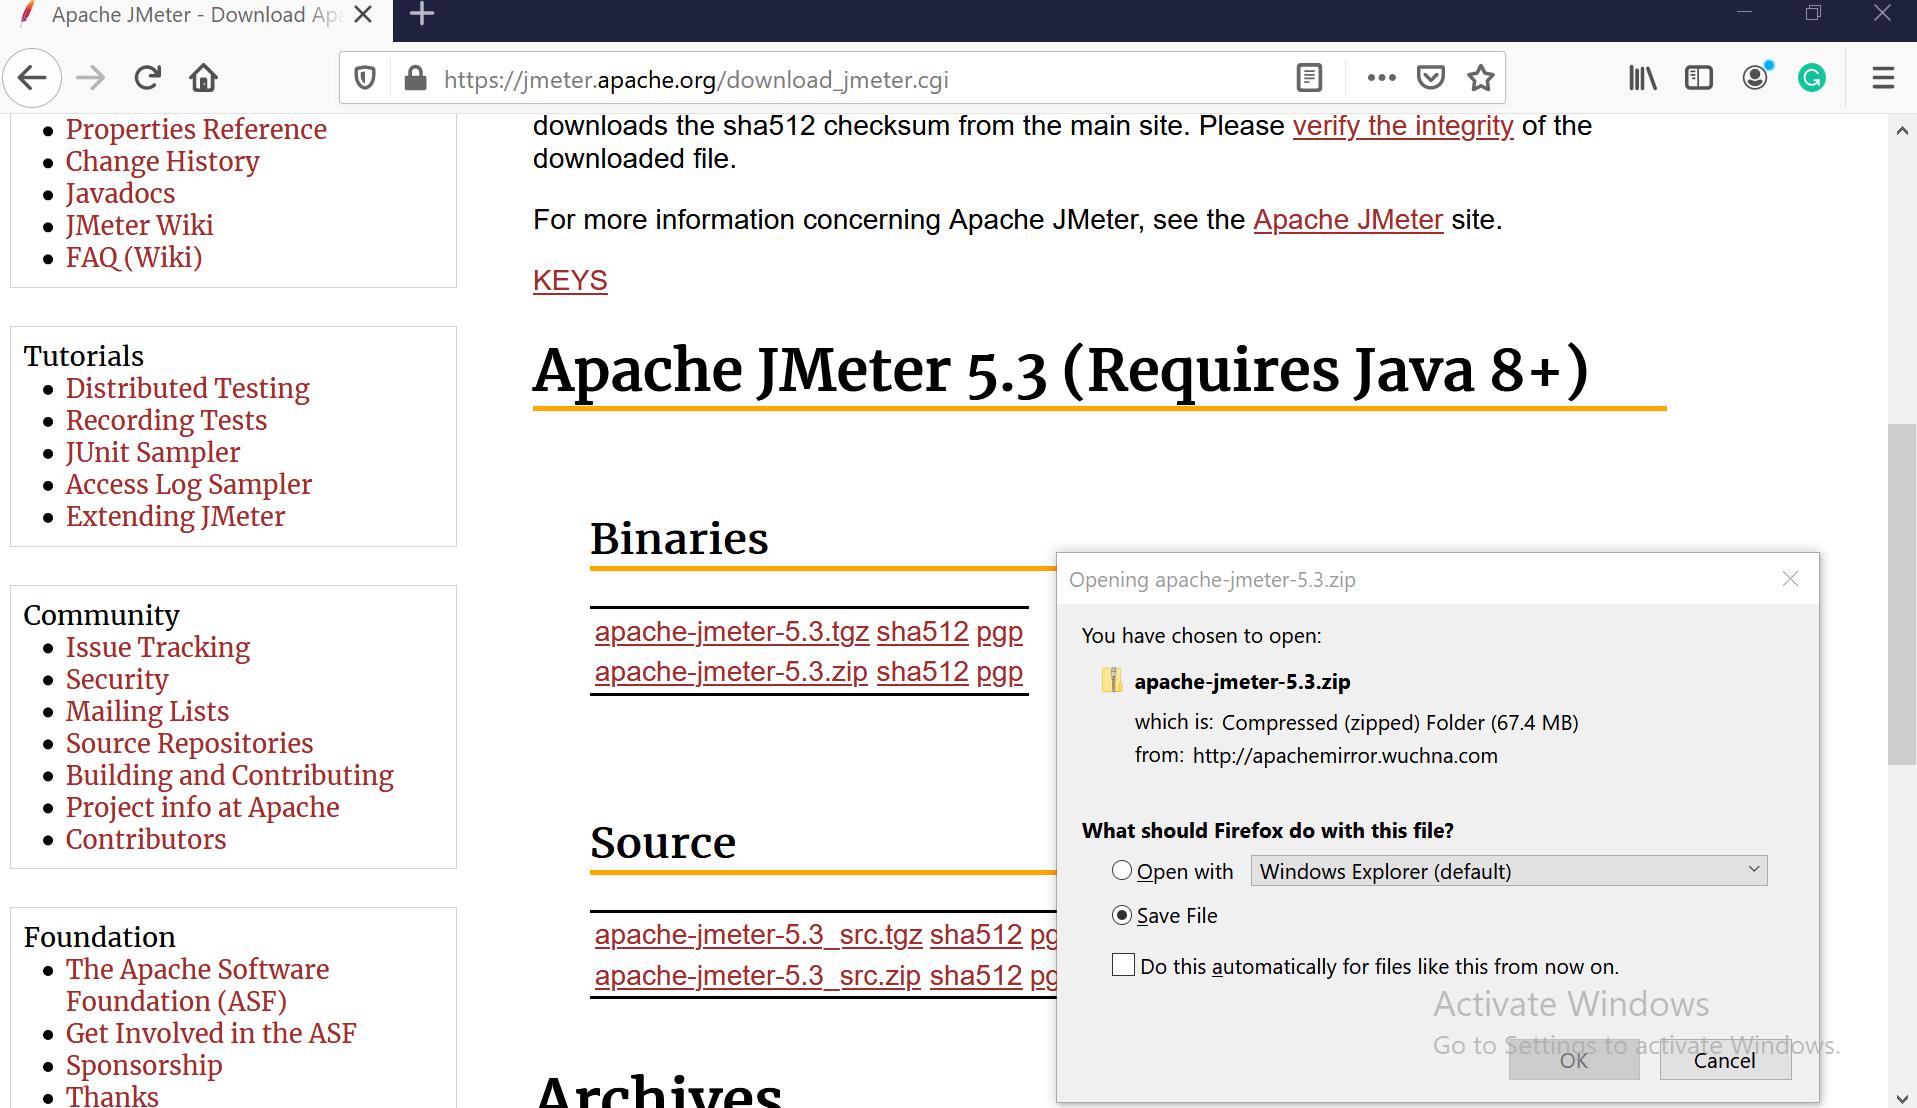 Apache JMeter Download